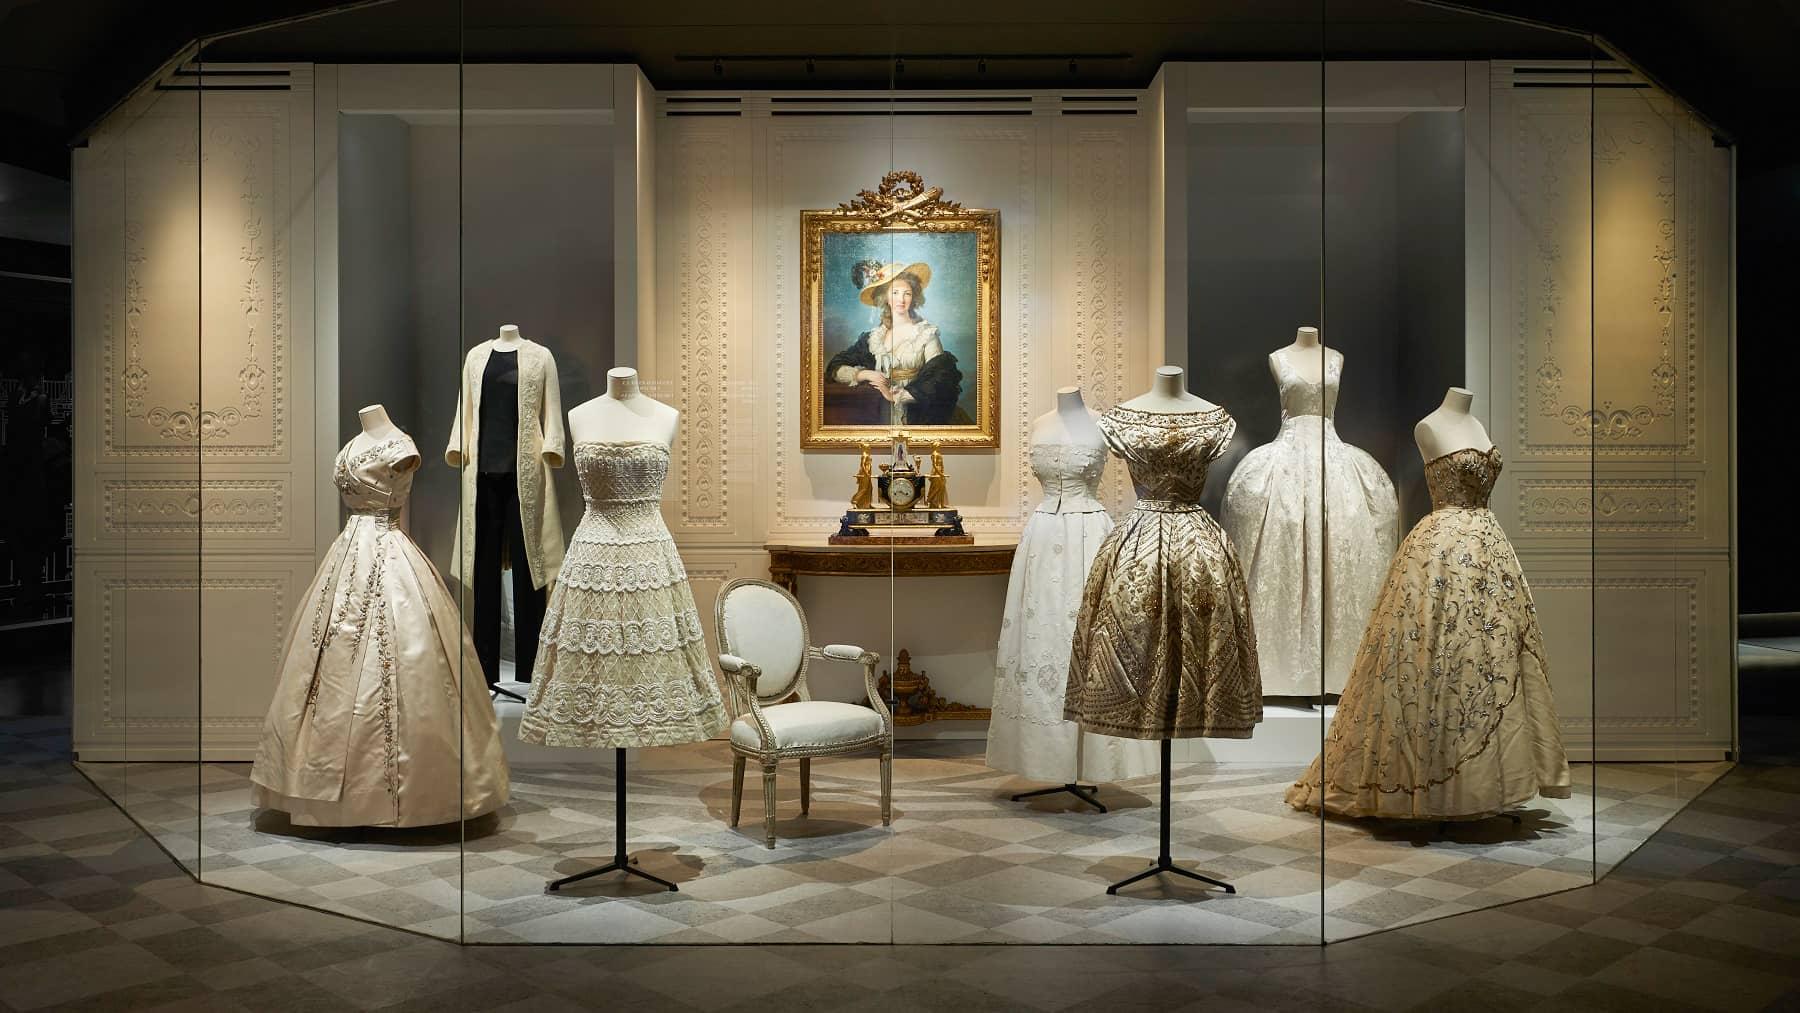 Dior-exhibition-at-Musee-des-Arts-Decoratifs